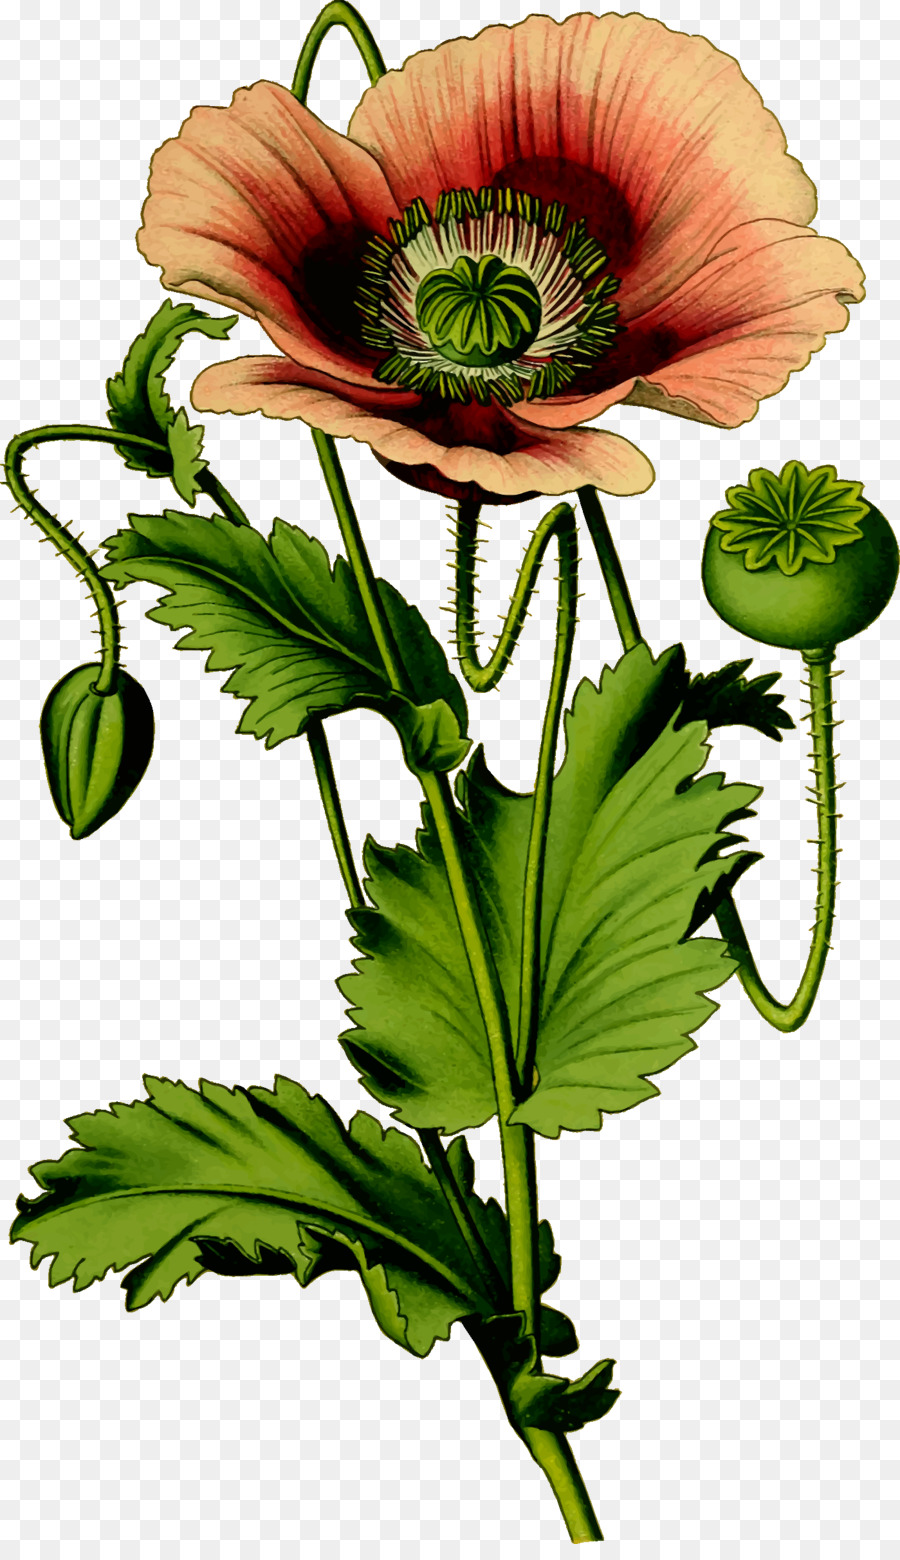 Opium Poppy Plant Common Poppy Poppy Png Download 13992400